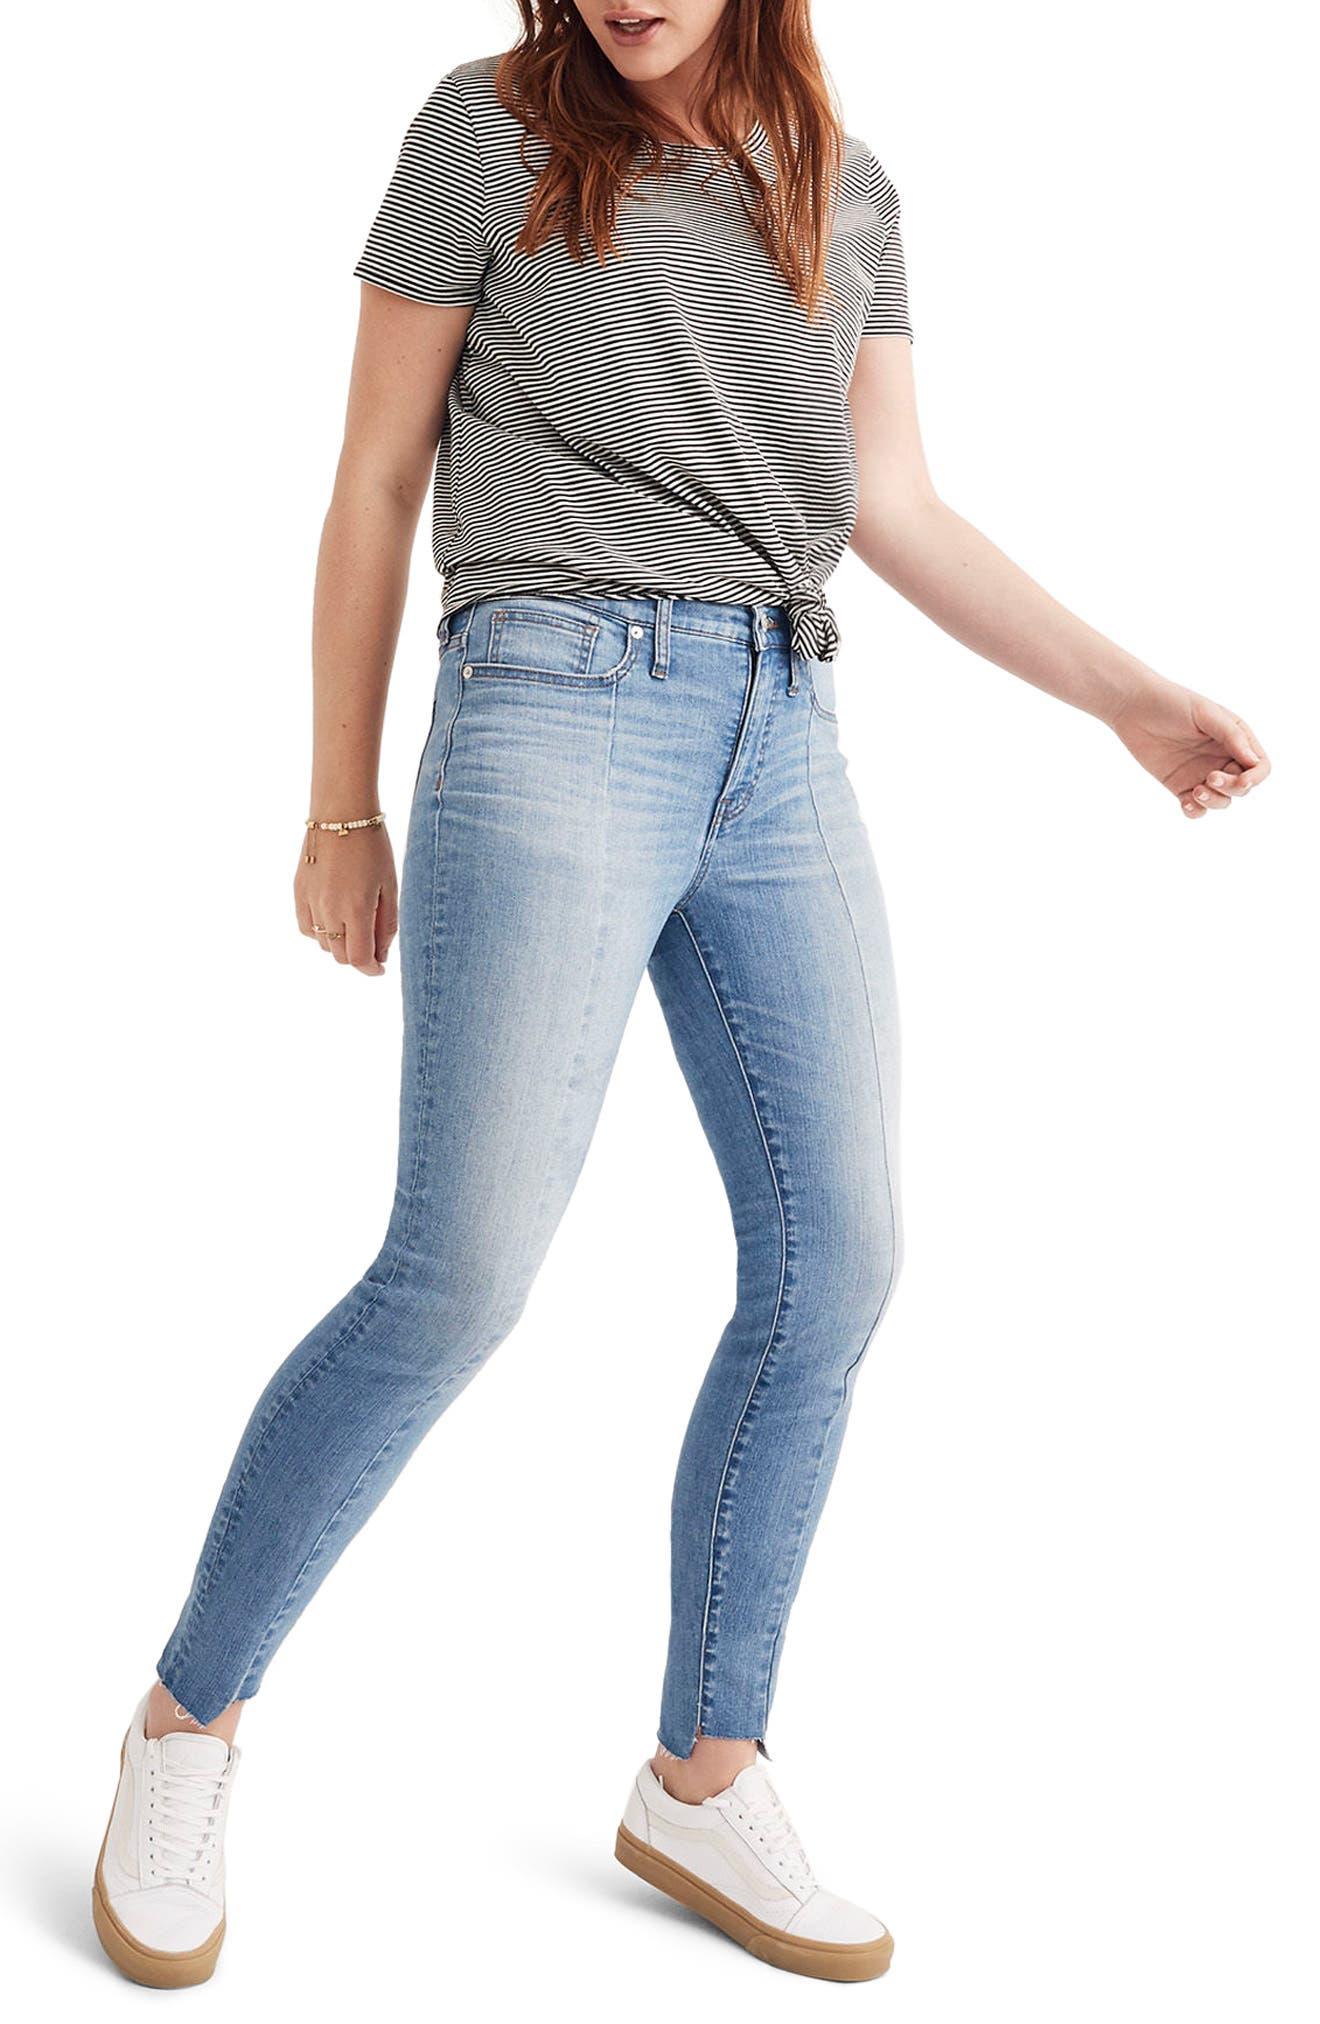 Alternate Image 1 Selected - Madewell 9-Inch Seamed High Waist Step Hem Skinny Jeans (August)